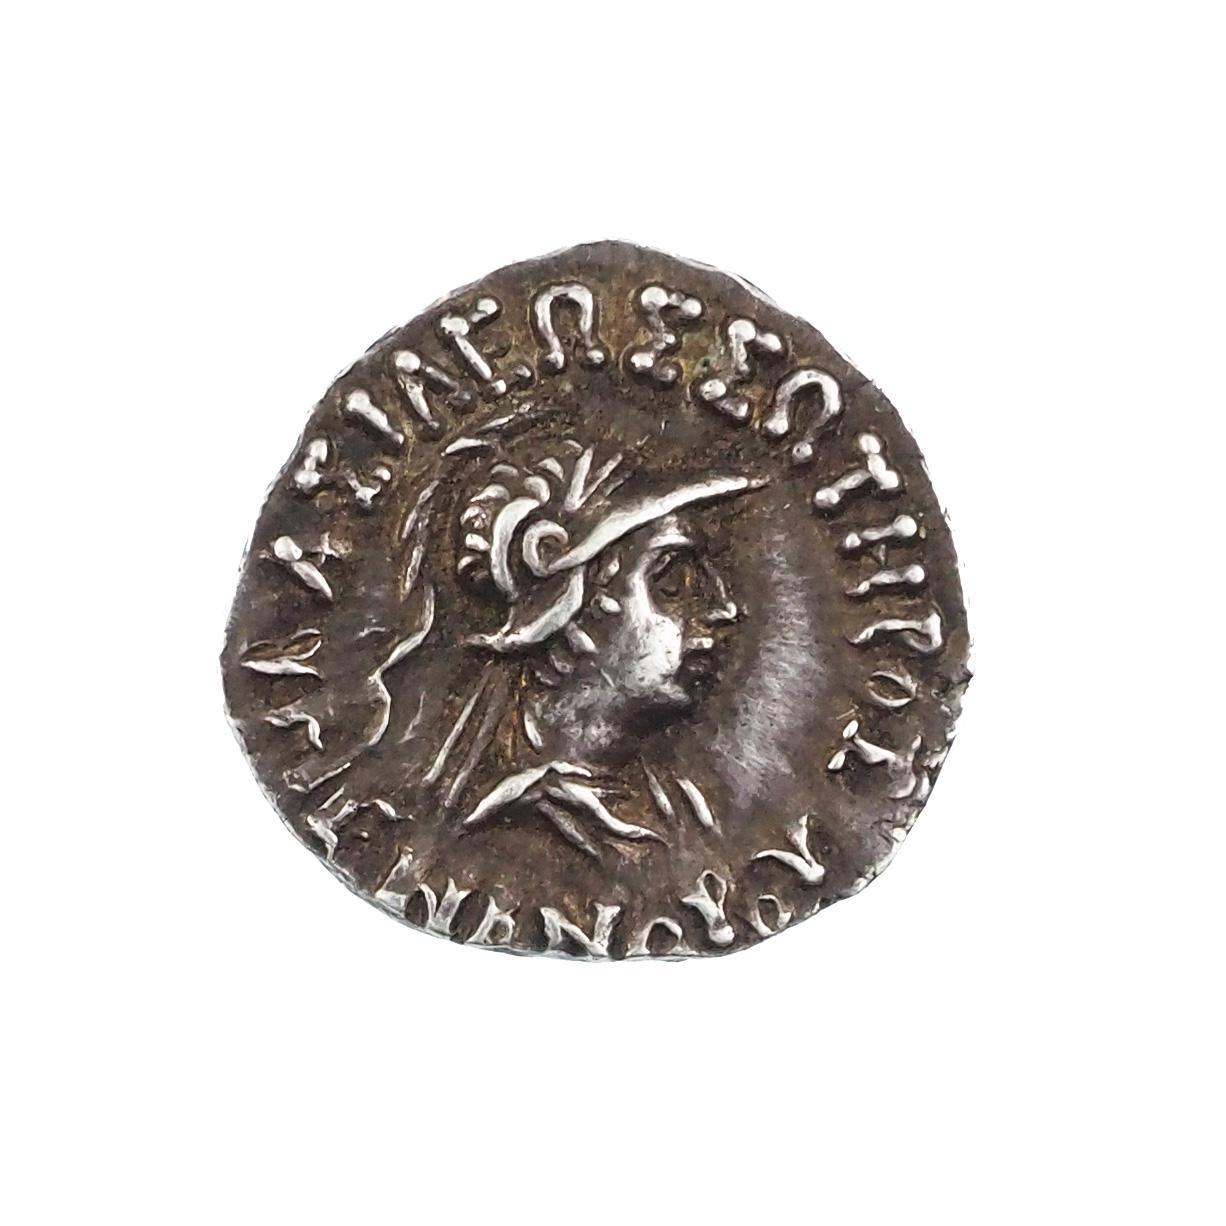 Royaume Bactriane, Ménandre Ier Soter (165-130), Drachme Bilingue, Gandhara